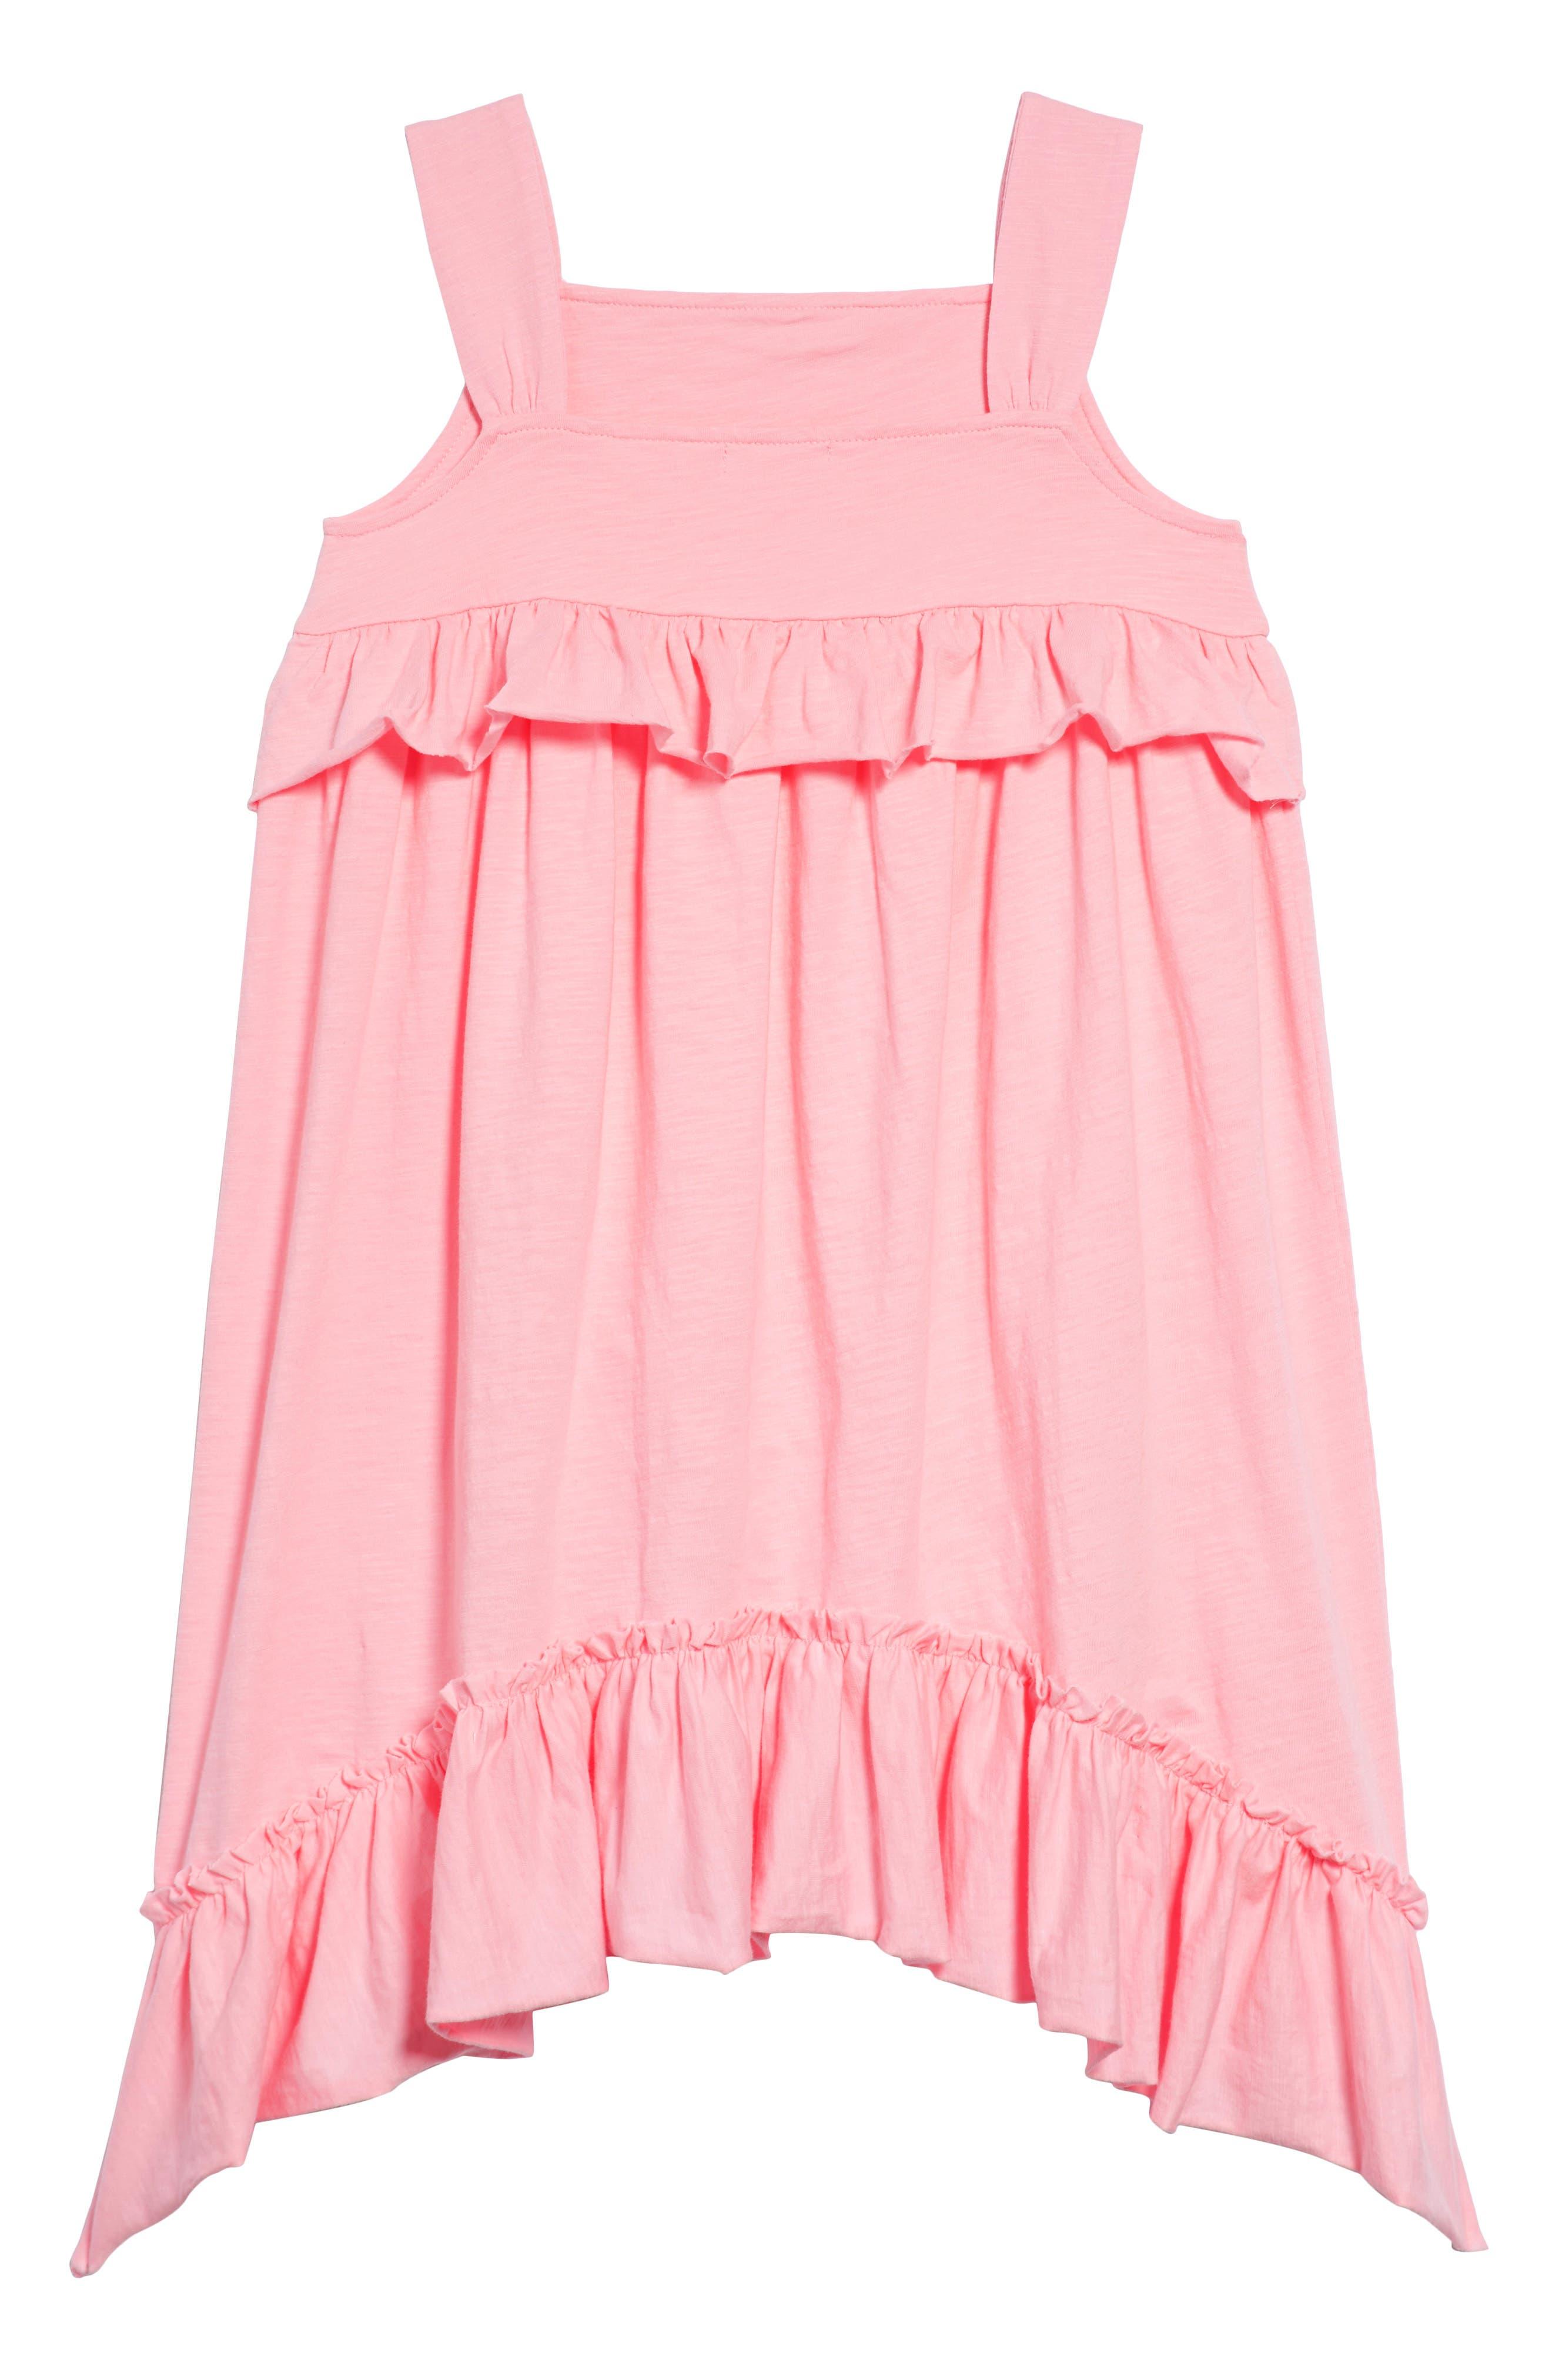 Mimi Ruffle Dress,                             Alternate thumbnail 3, color,                             Neon Petal Pk-5038